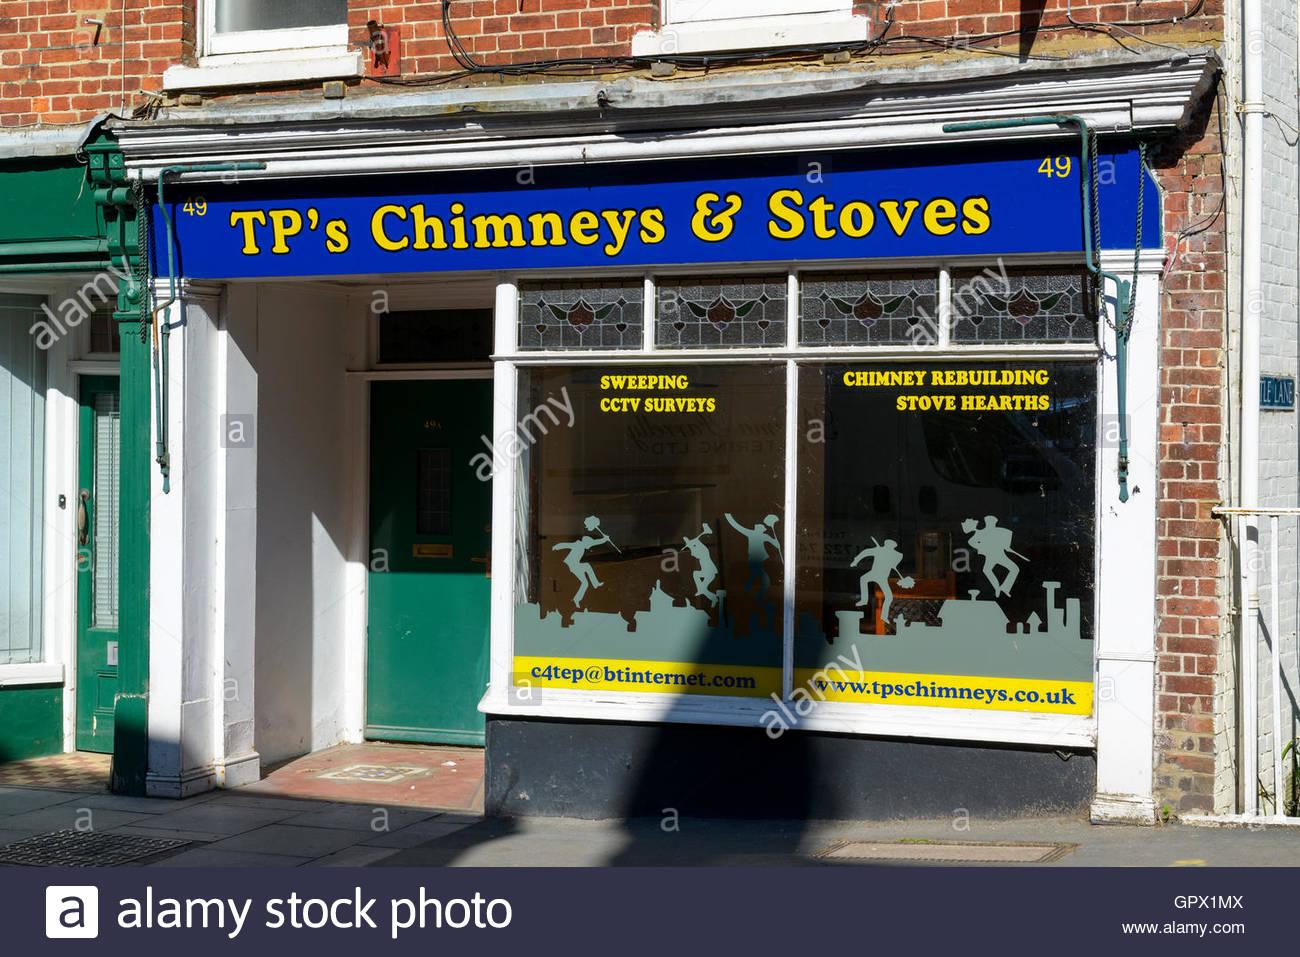 TP's Chimneys & Stoves shop, Wilton, Wiltshire, England UK - Stock Image